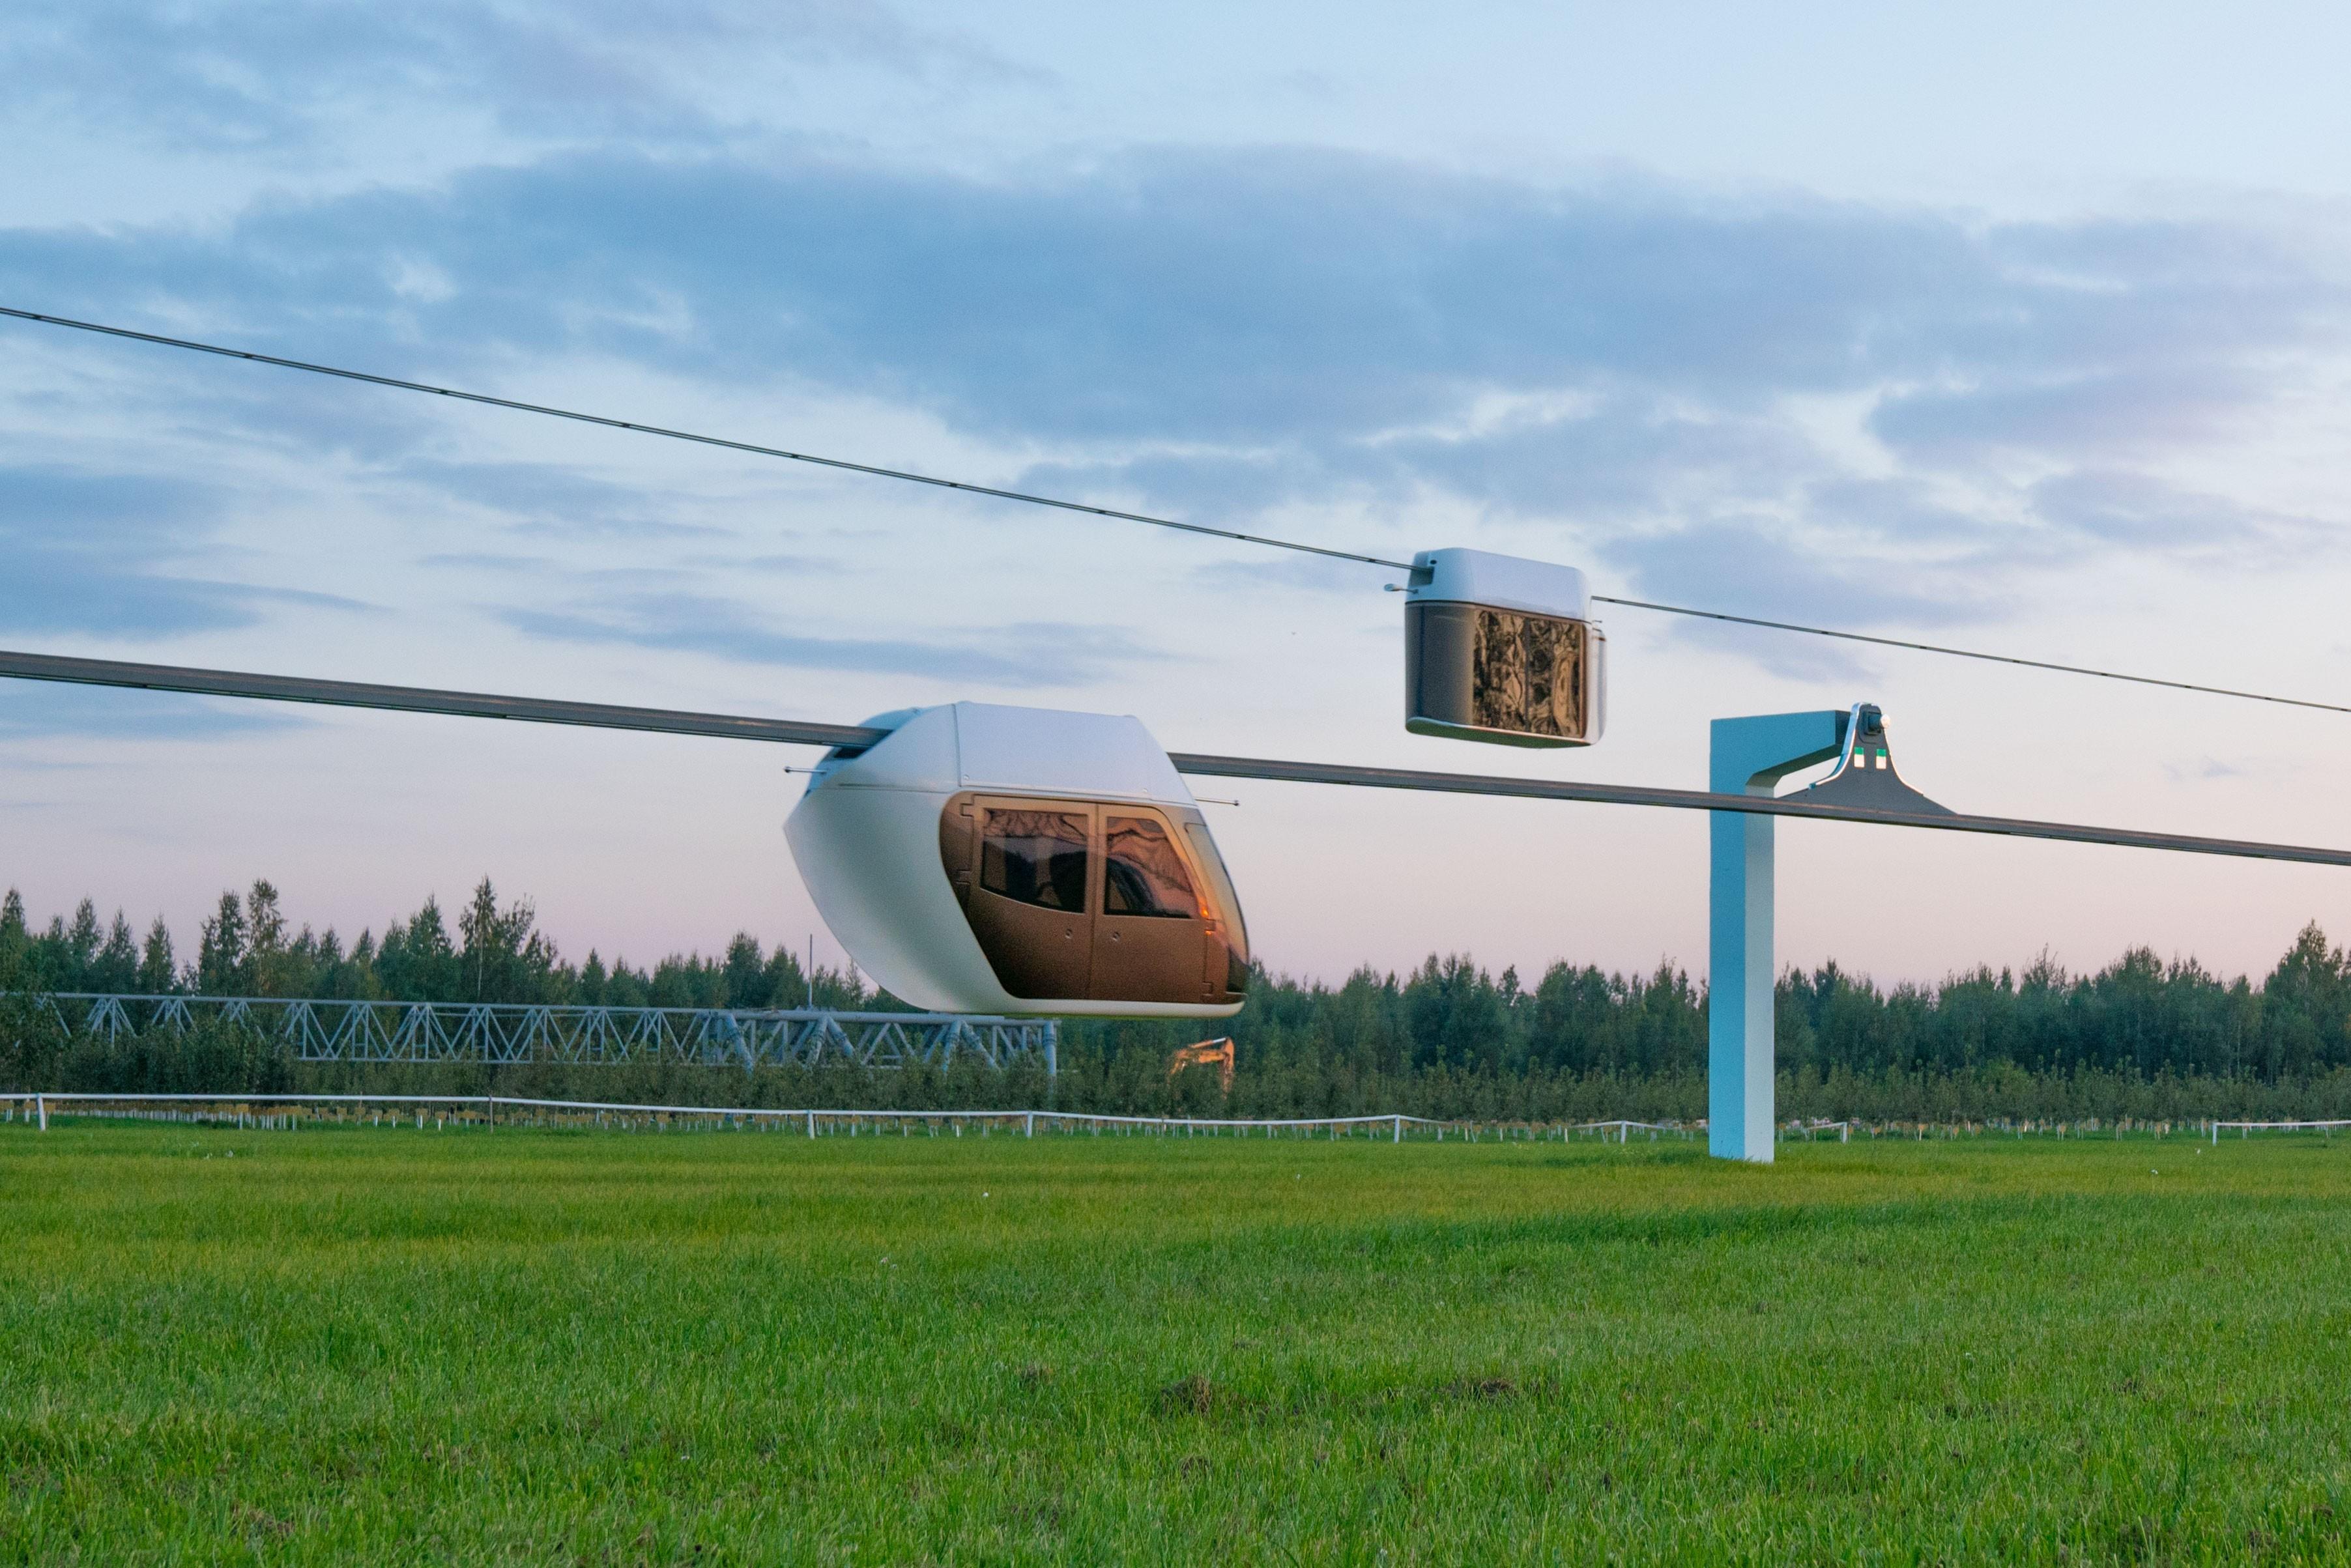 SkyWay ubibike unibus EcoTechnoPark Скайвей юнибус юнибайк ЭкоТехноПарк